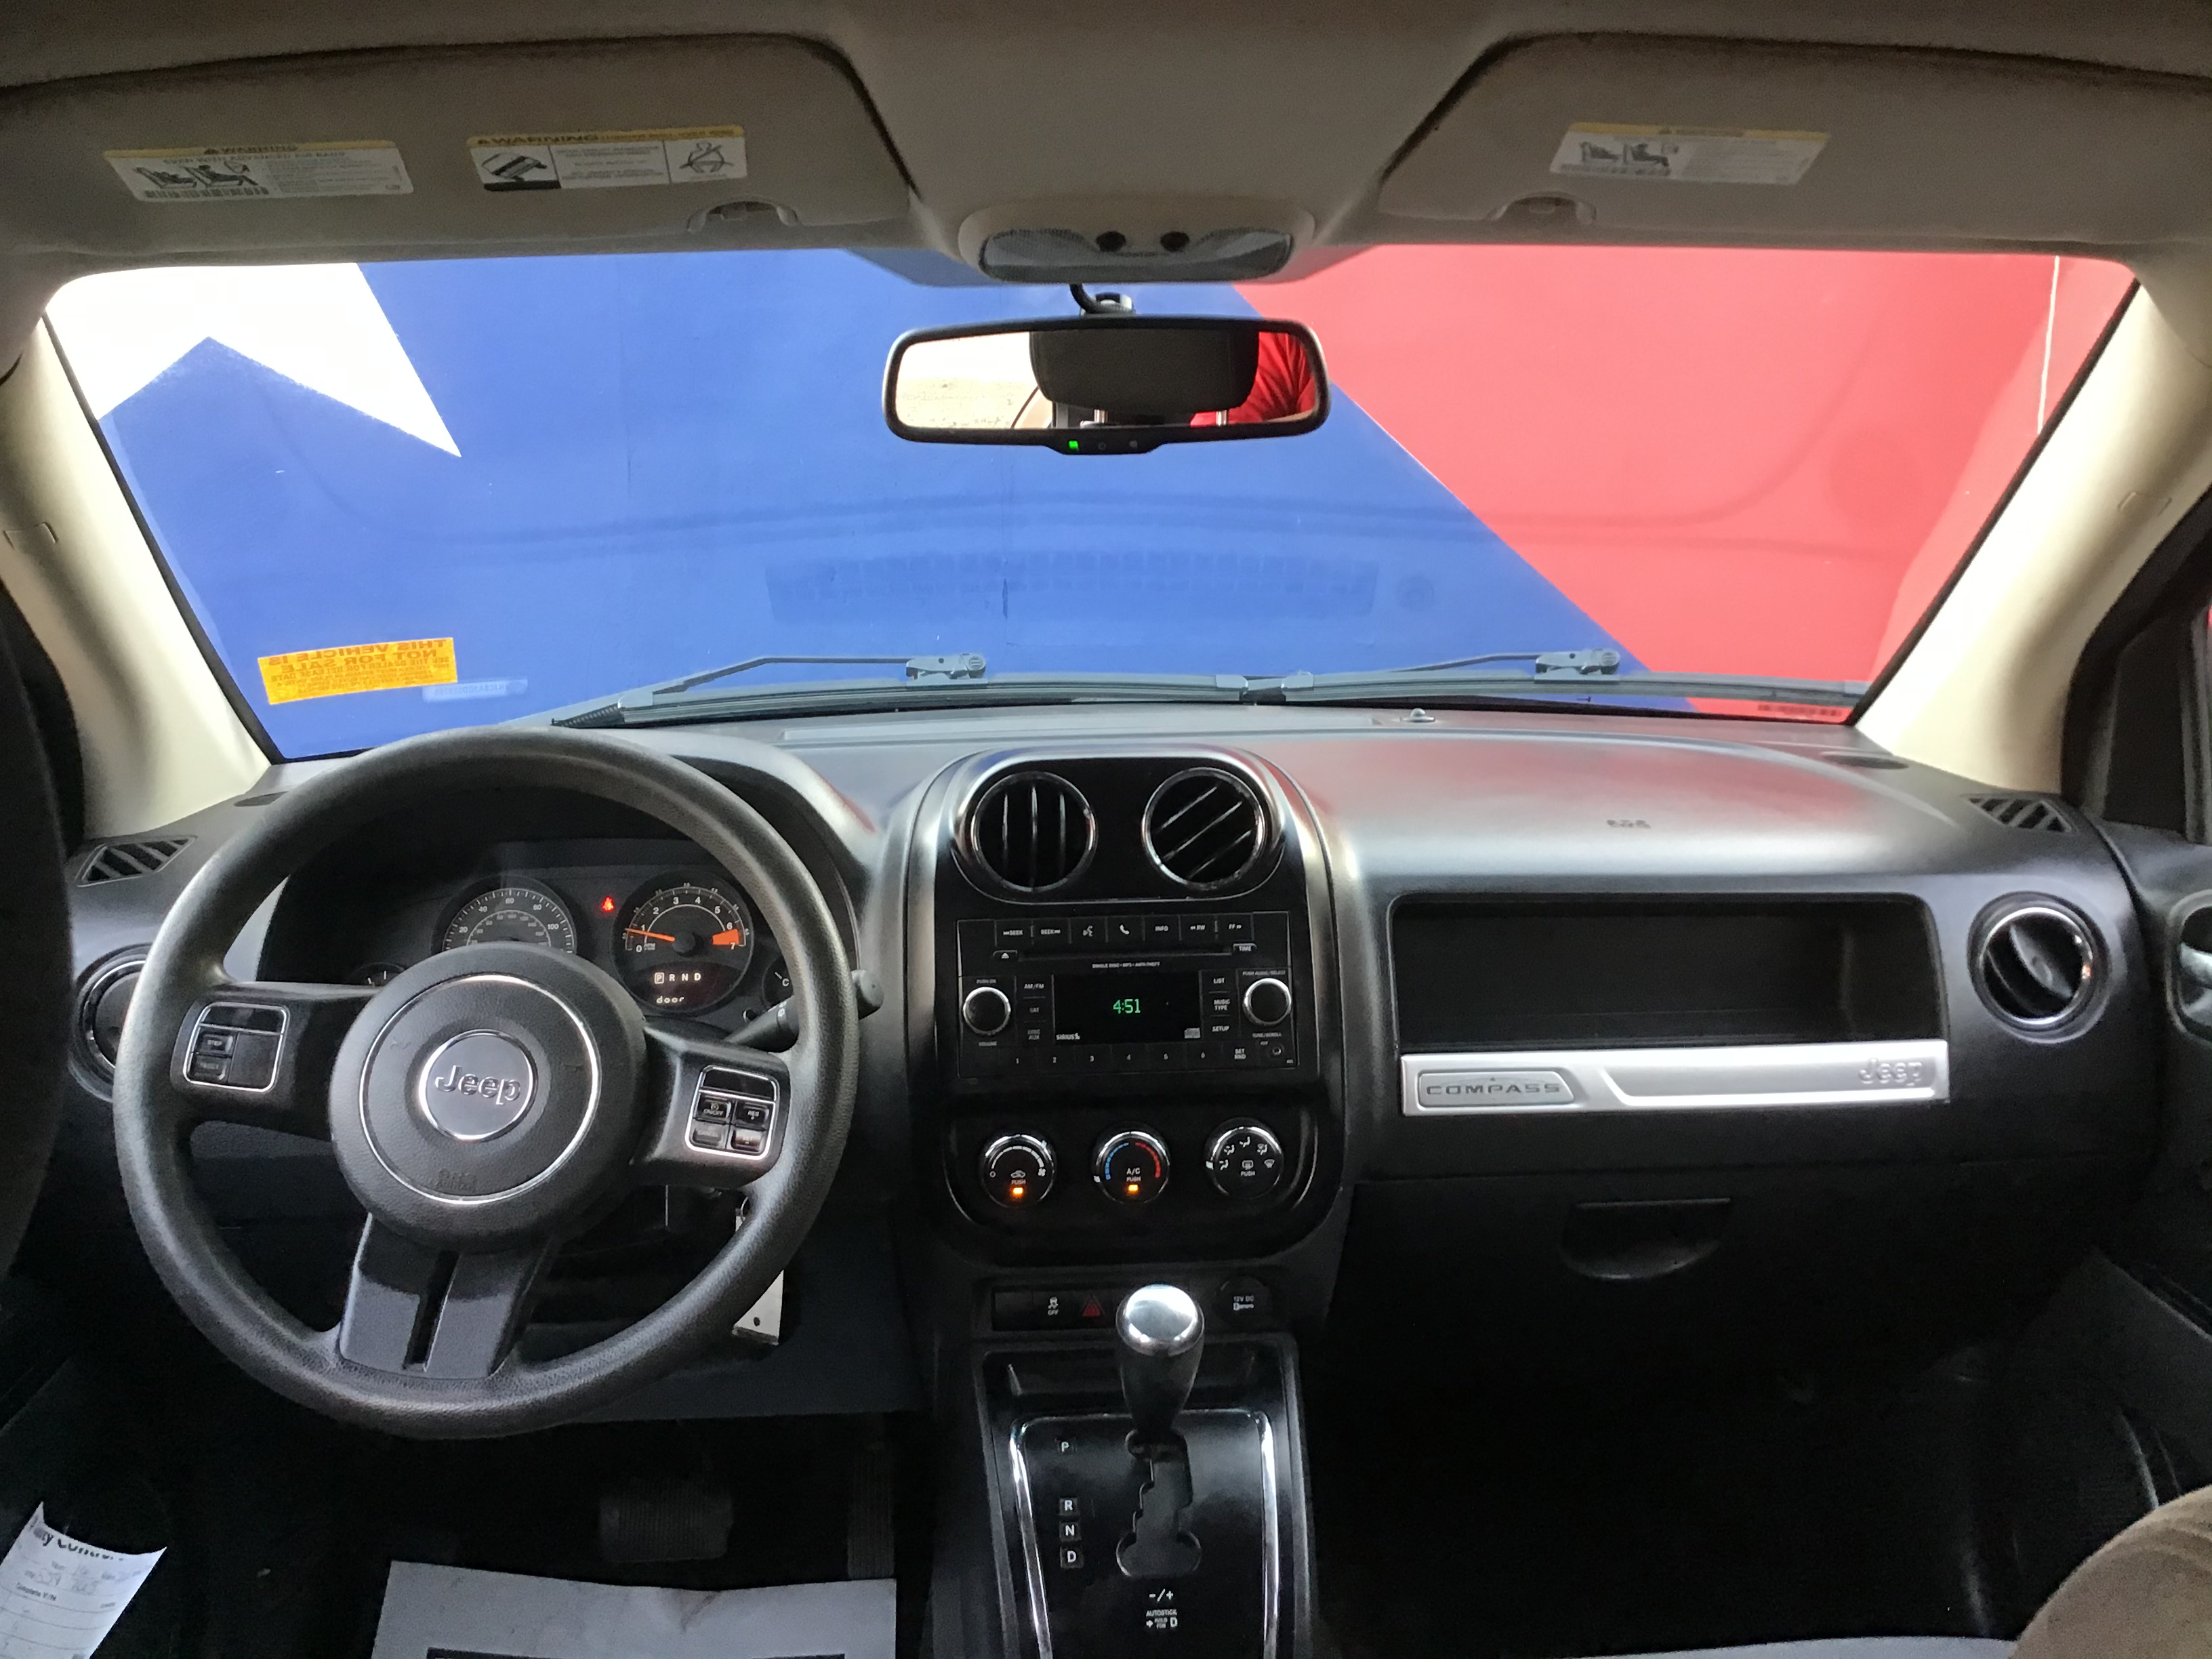 used vehicle - SUV JEEP COMPASS 2016